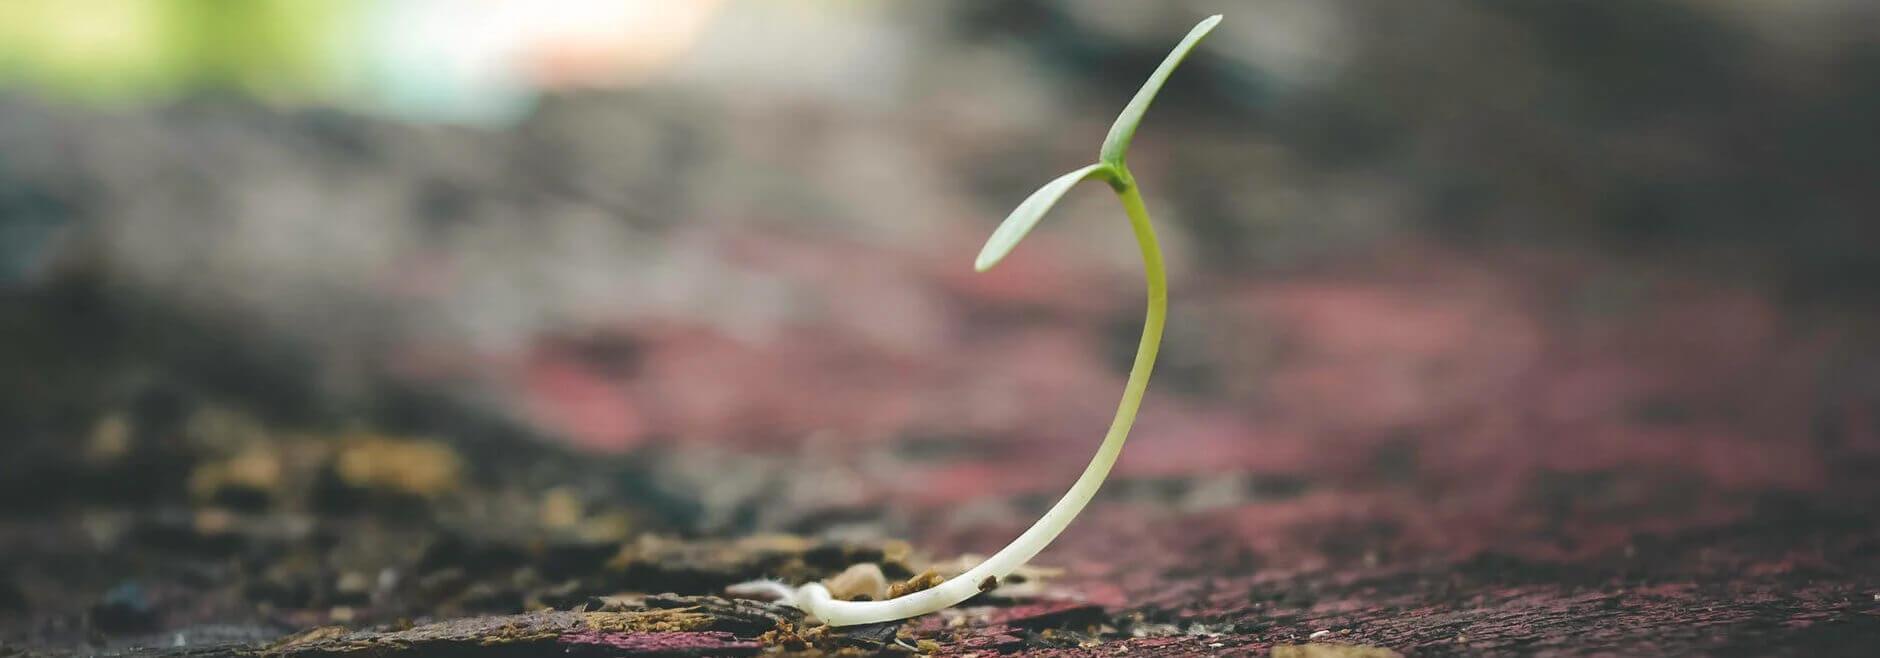 image of seedling